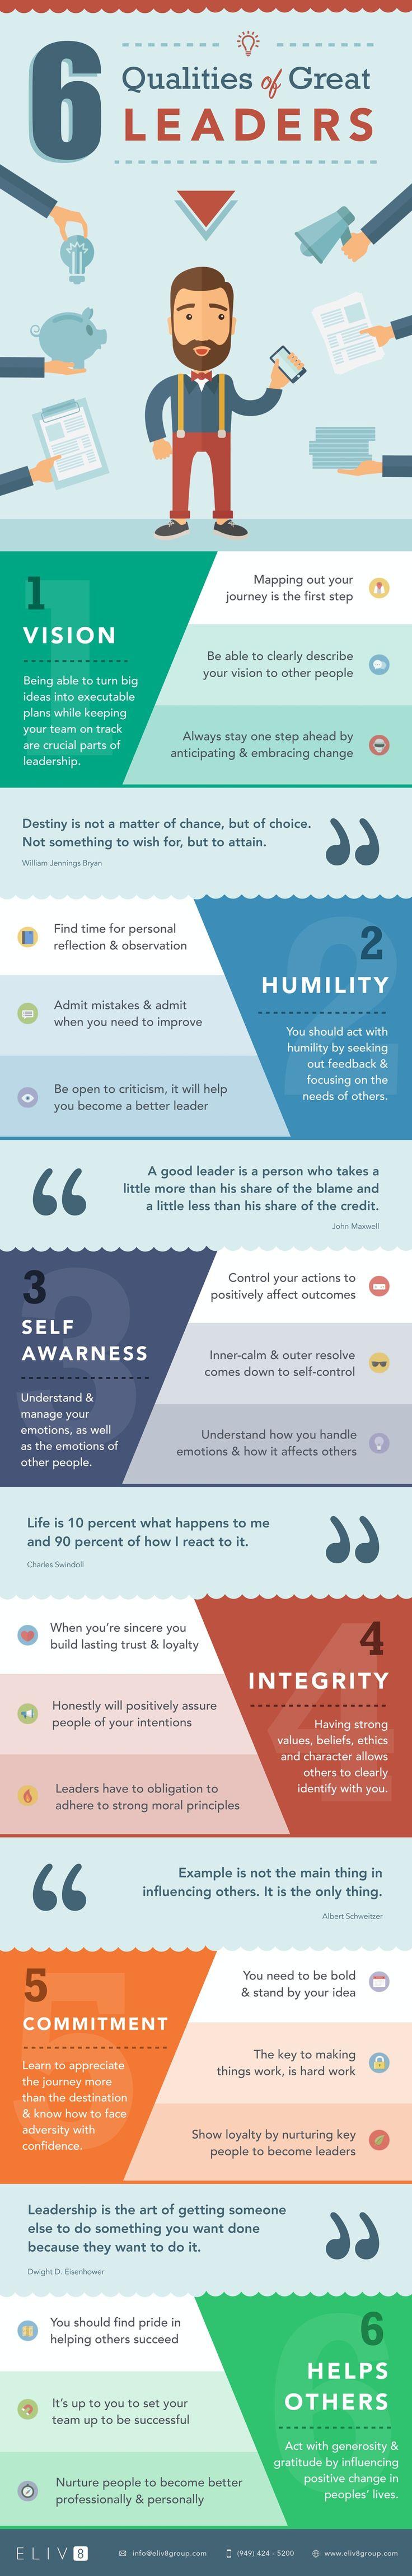 best good leadership qualities ideas leadership  6 cualidades de los grandes lideres leadership characteristicsqualities